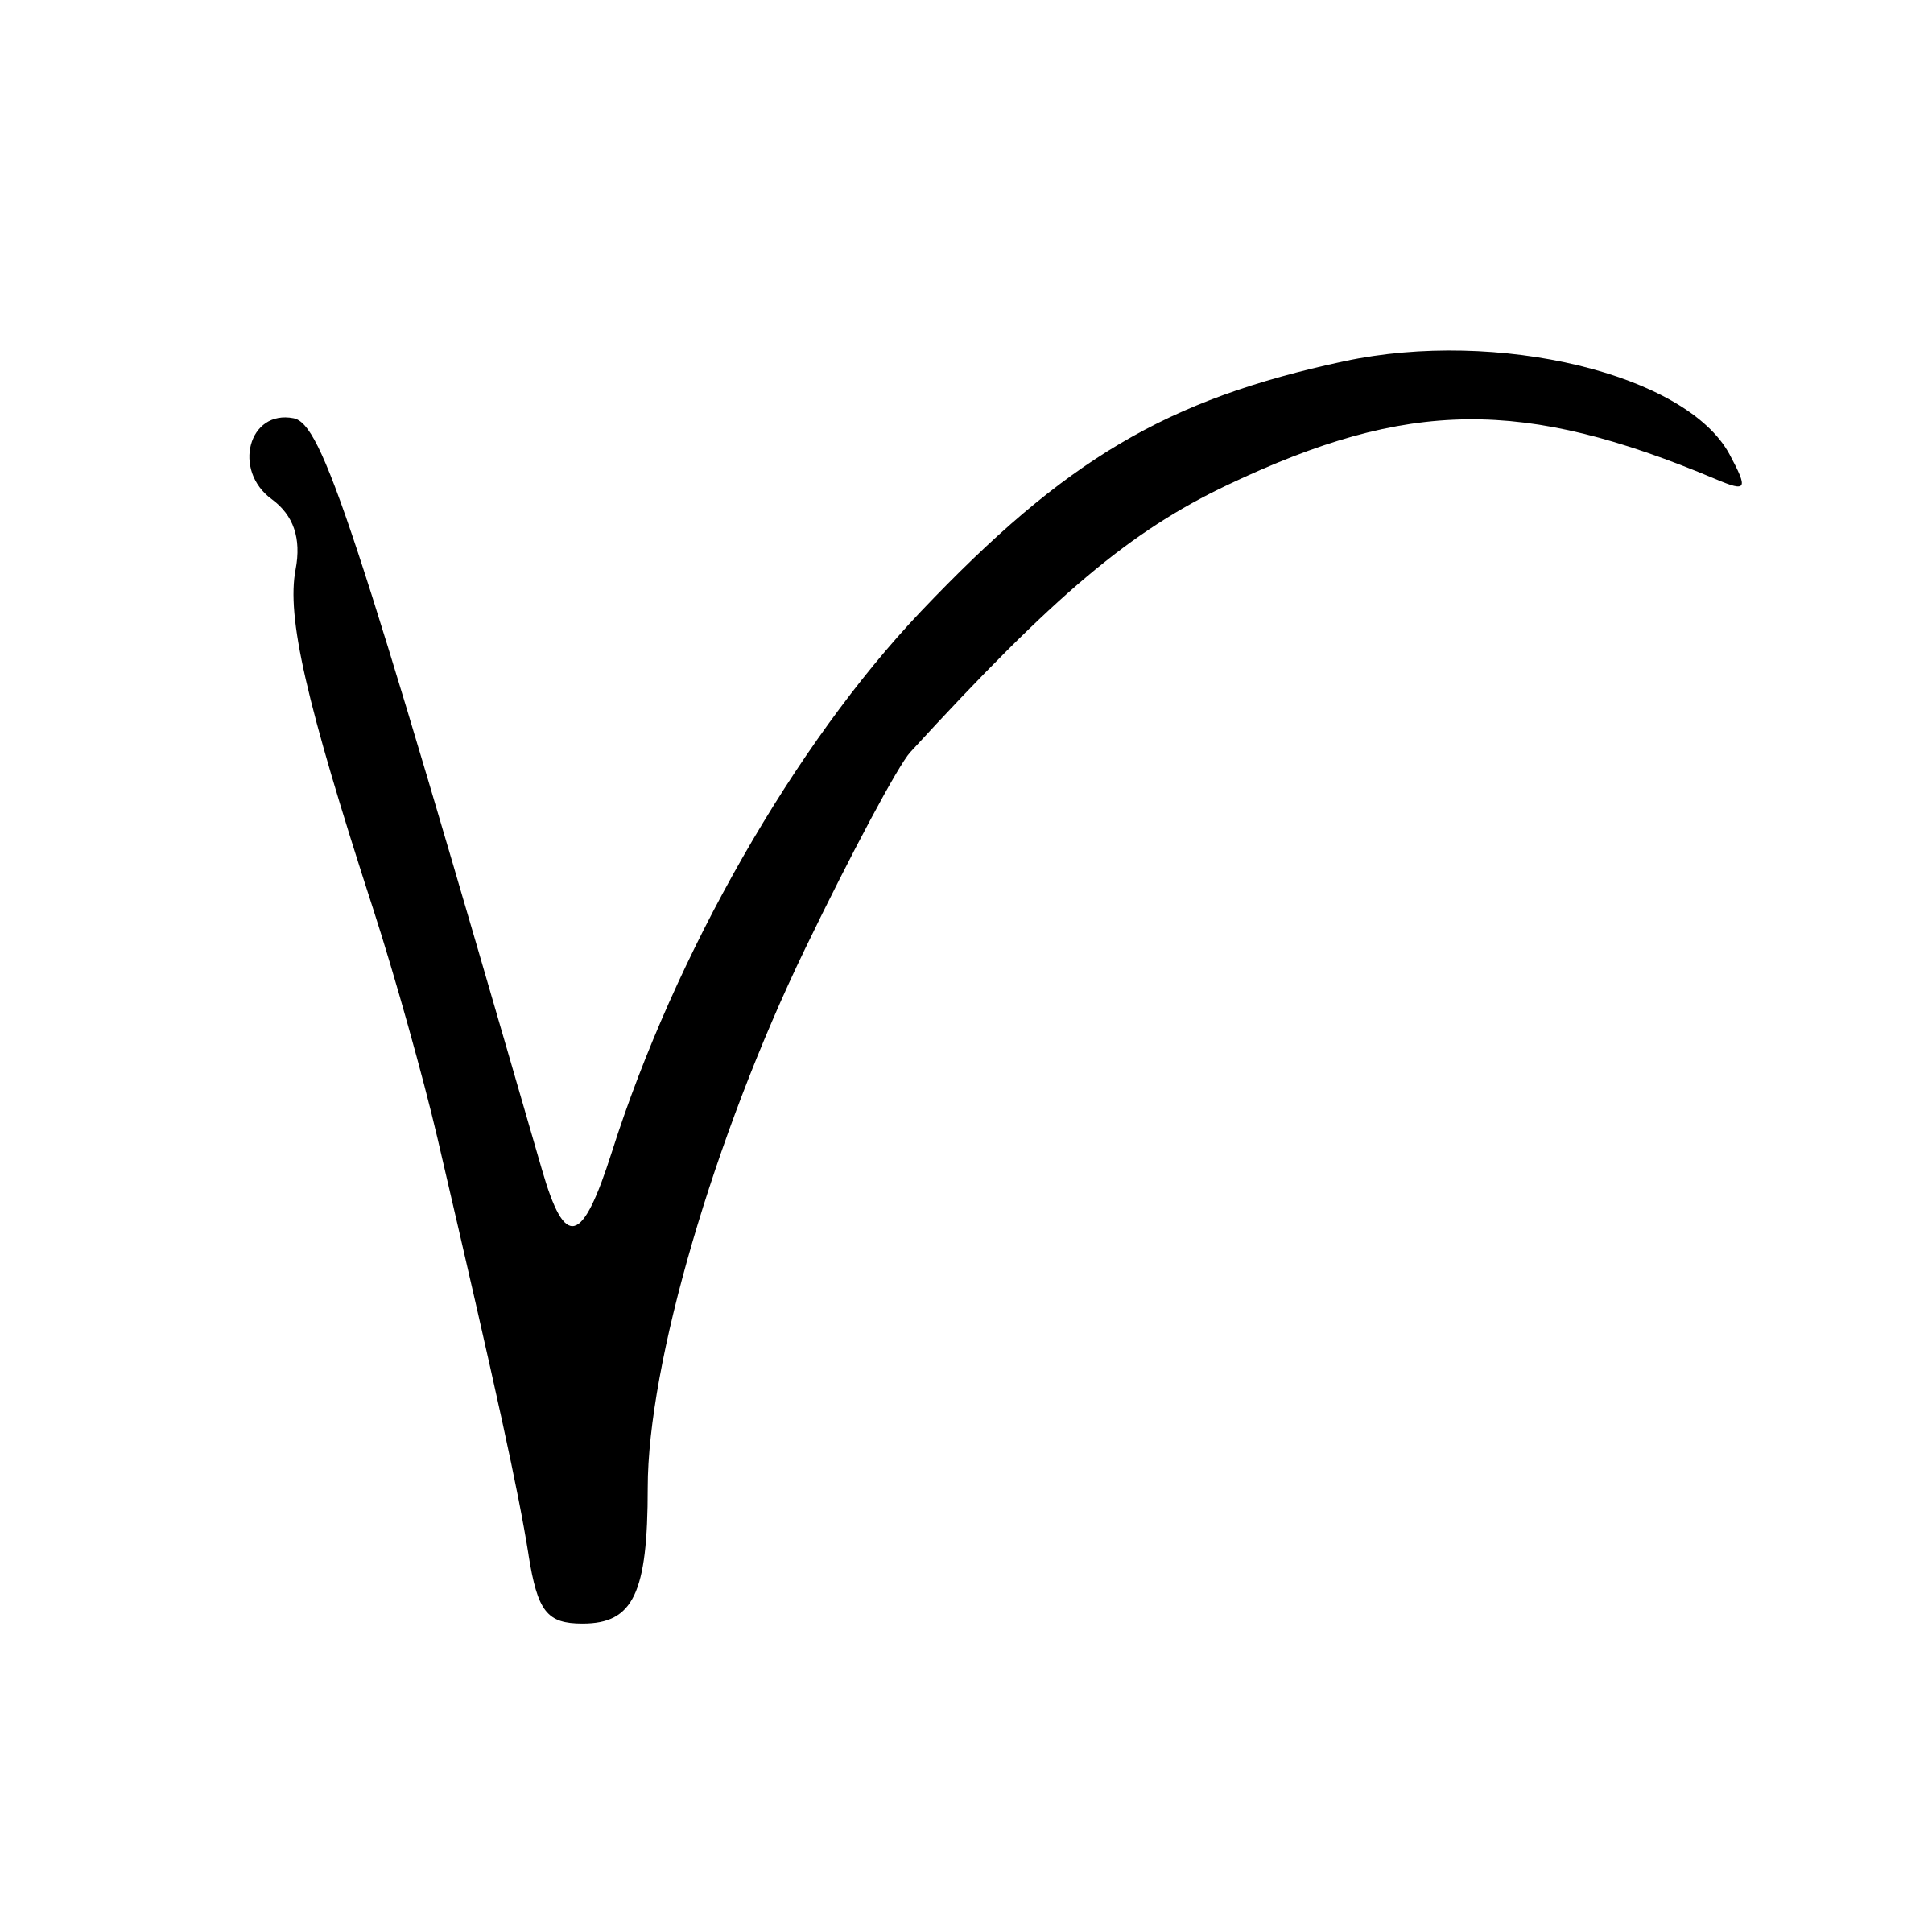 Clipart - Letter R